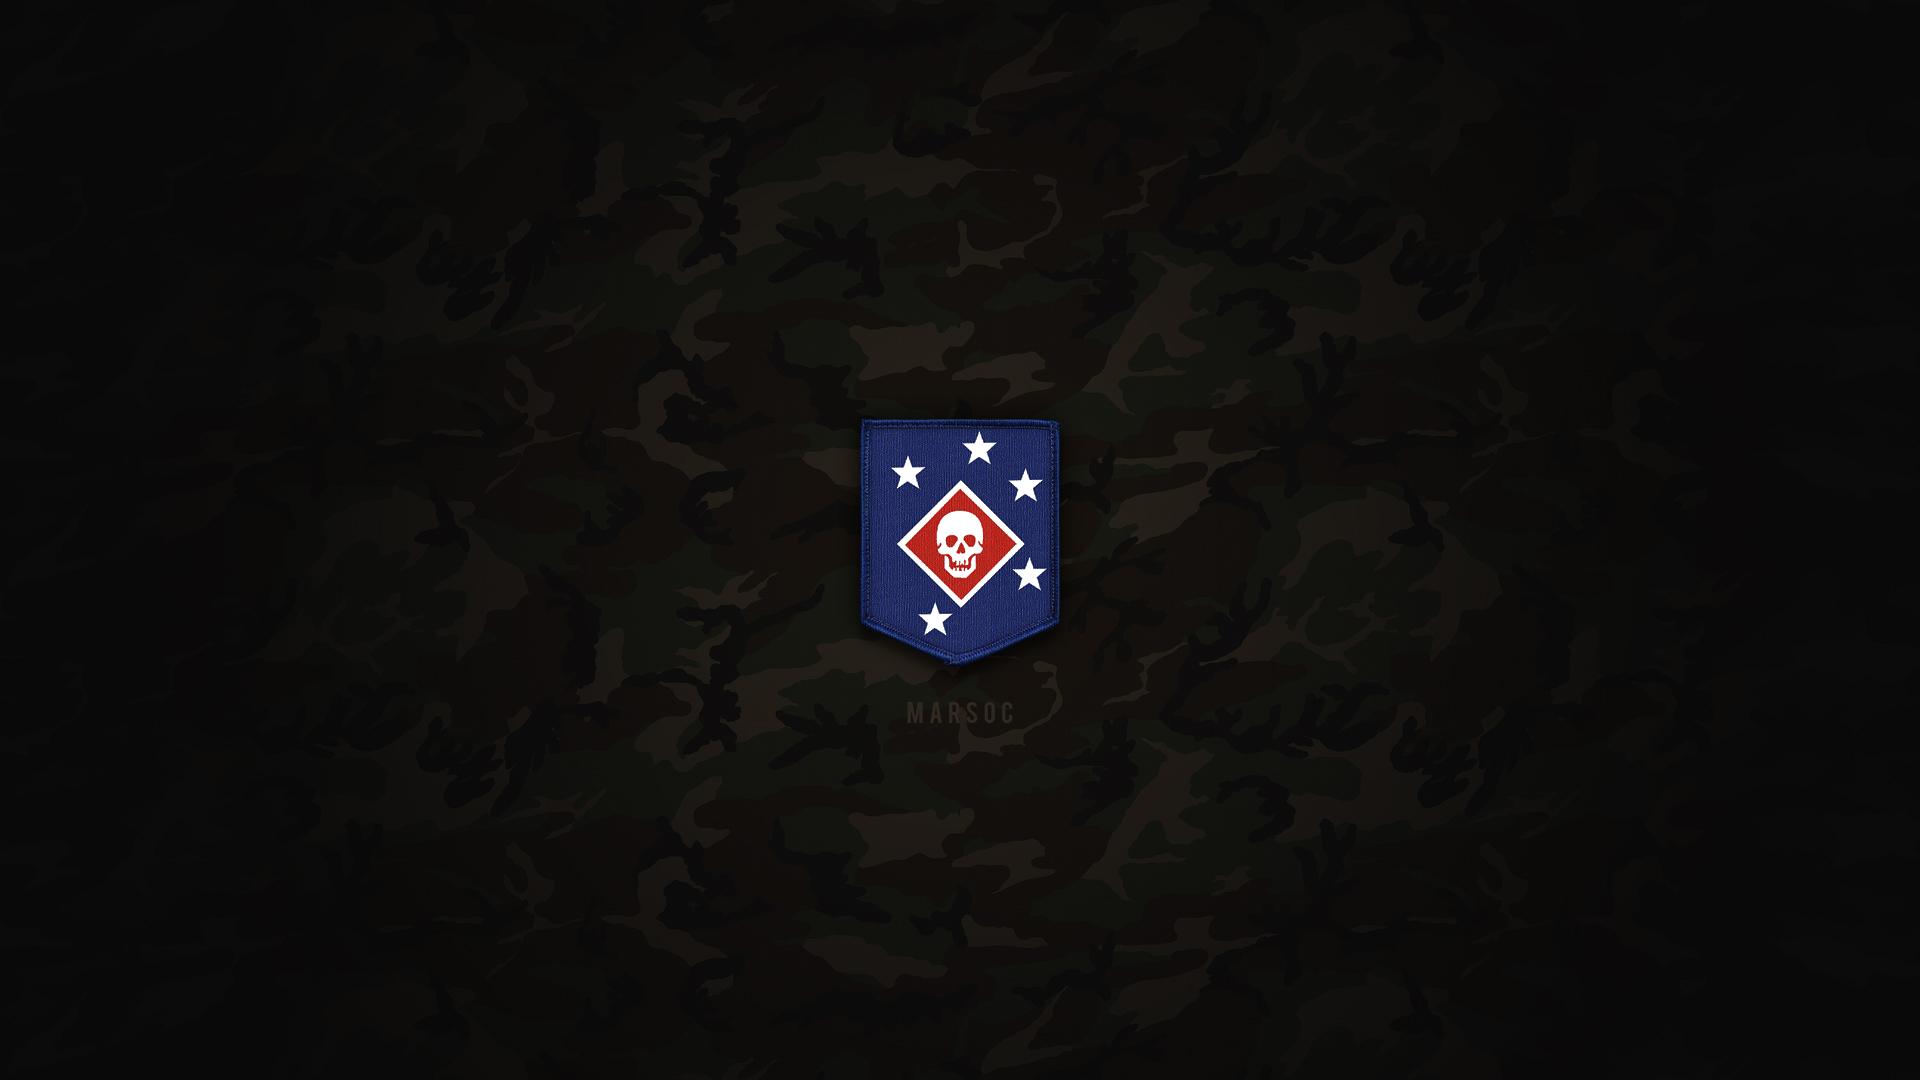 Marine Raider Patch | MARSOC | HD